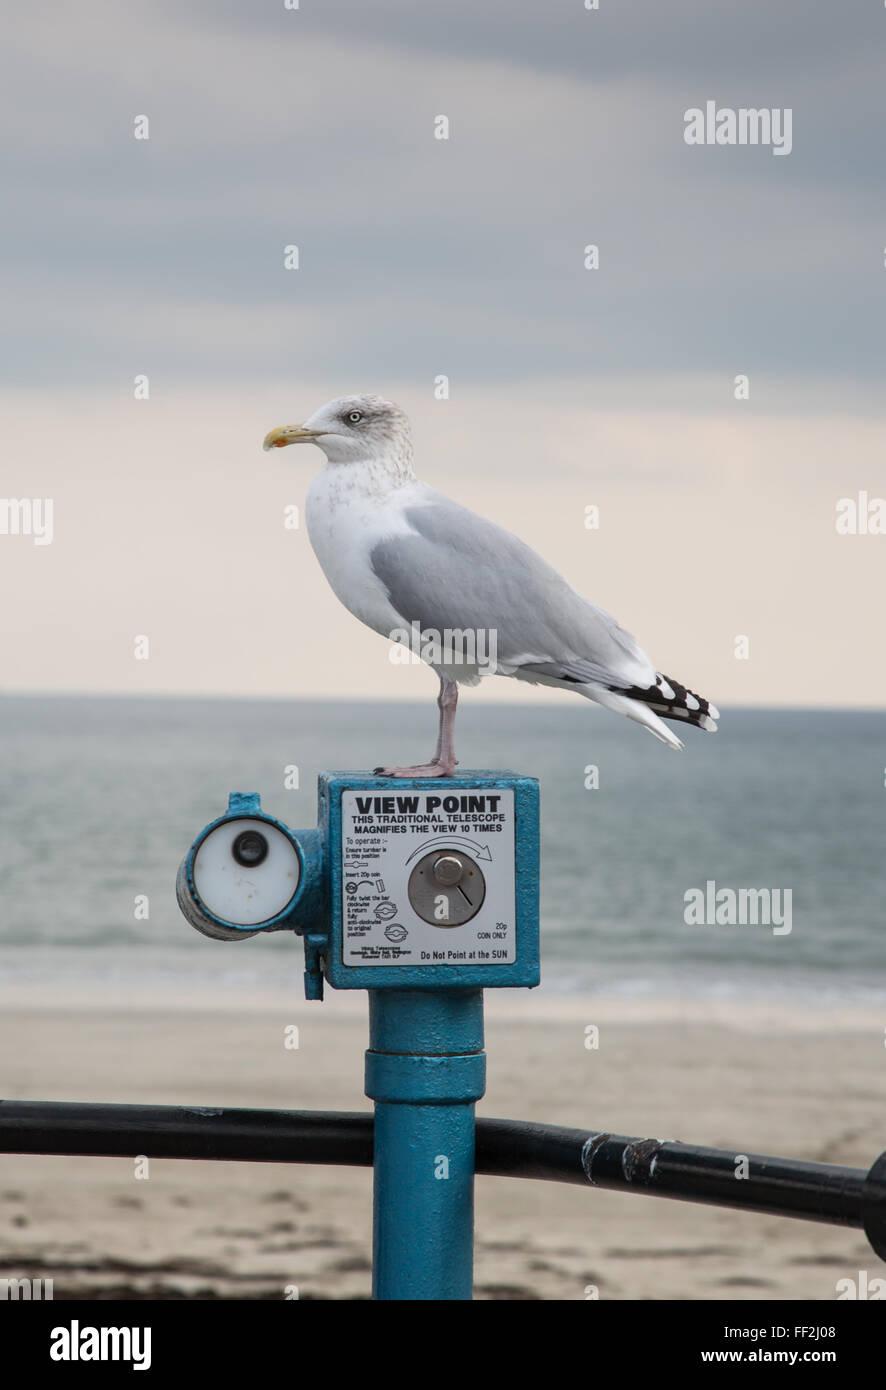 Seagull resting on top of promenade telescope - Stock Image